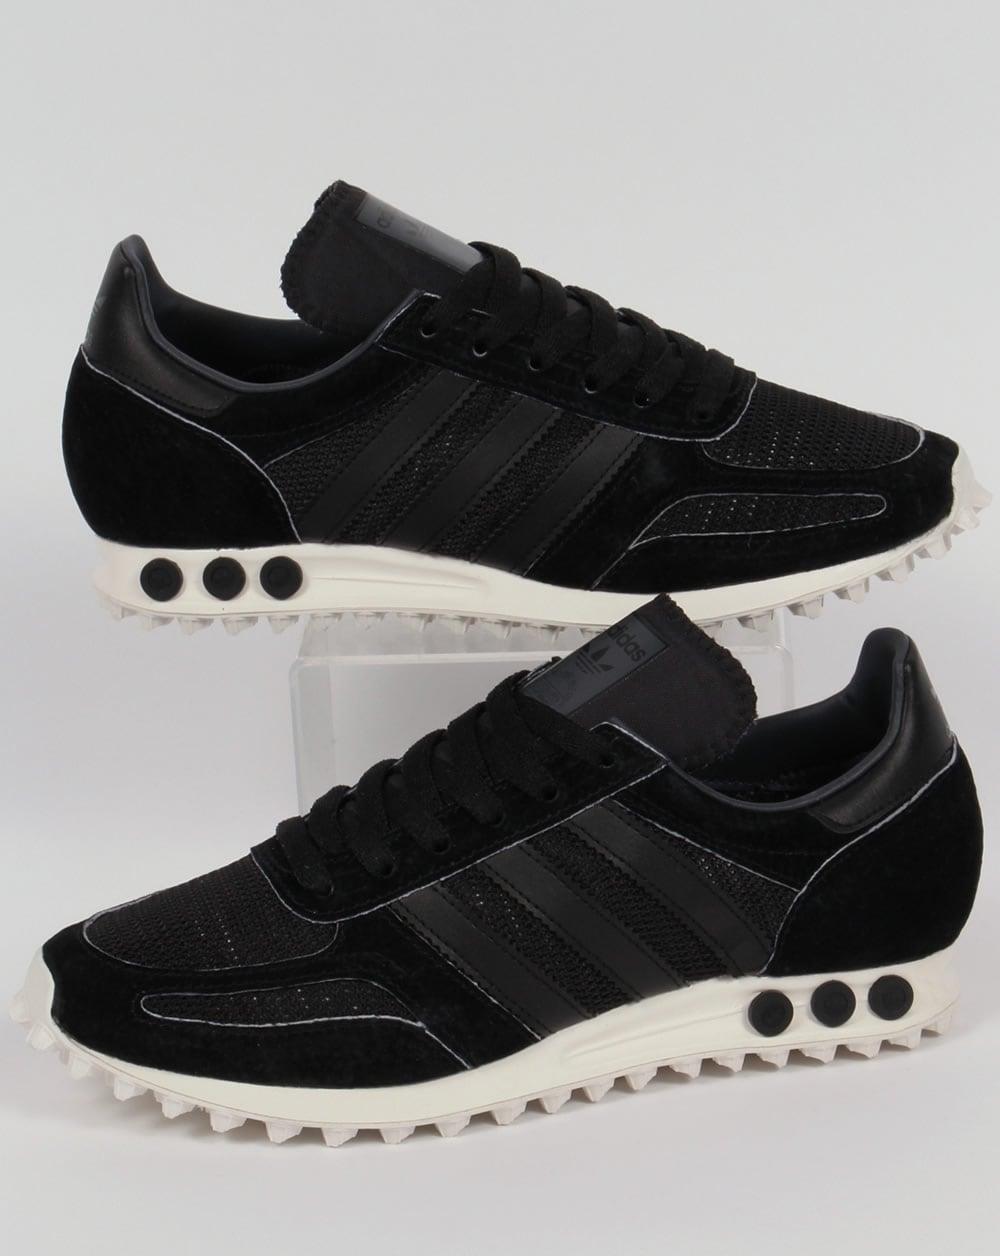 hot sale online 0b8f5 6298b adidas Trainers Adidas LA Trainer OG Trainers Black Black Grey